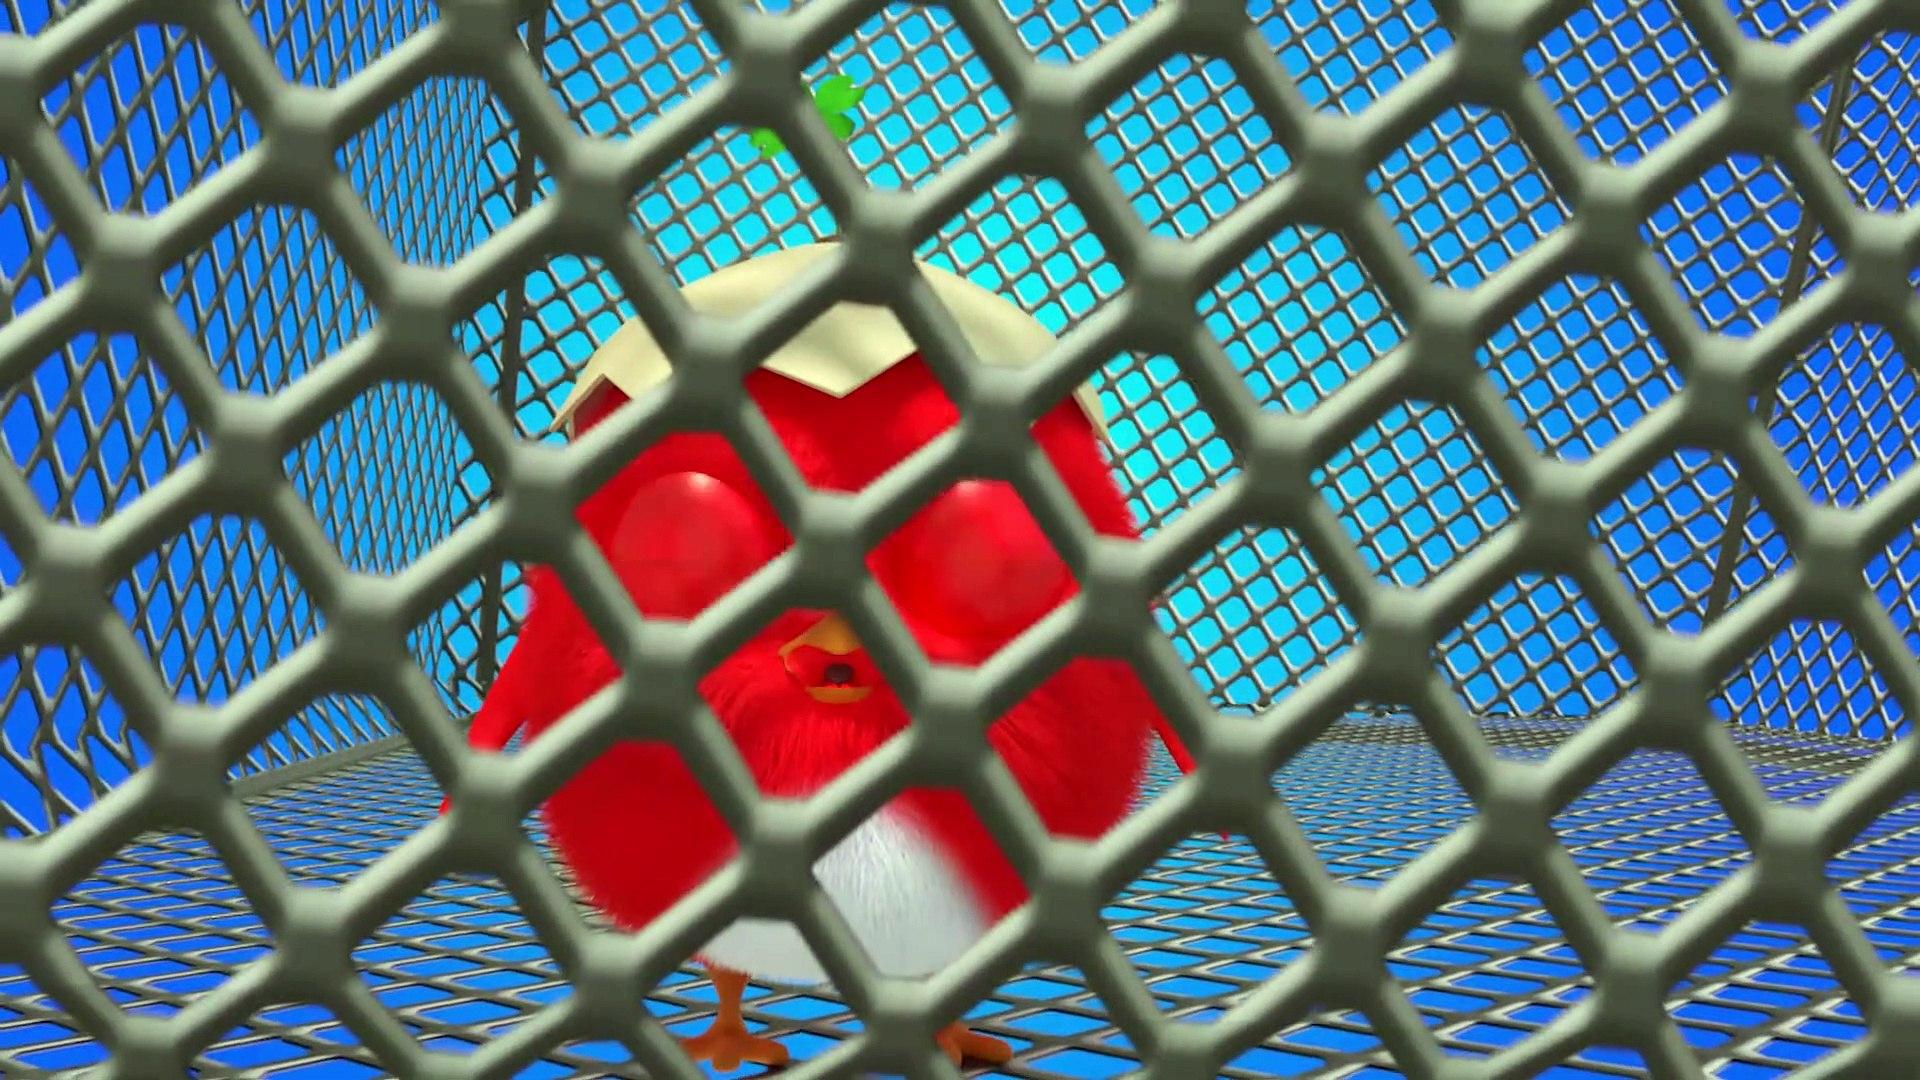 CucKoo Cartoon  Cuckoo Chicken 2019 - Part 3 Drôle de bande dessinée pour les enfants 2020